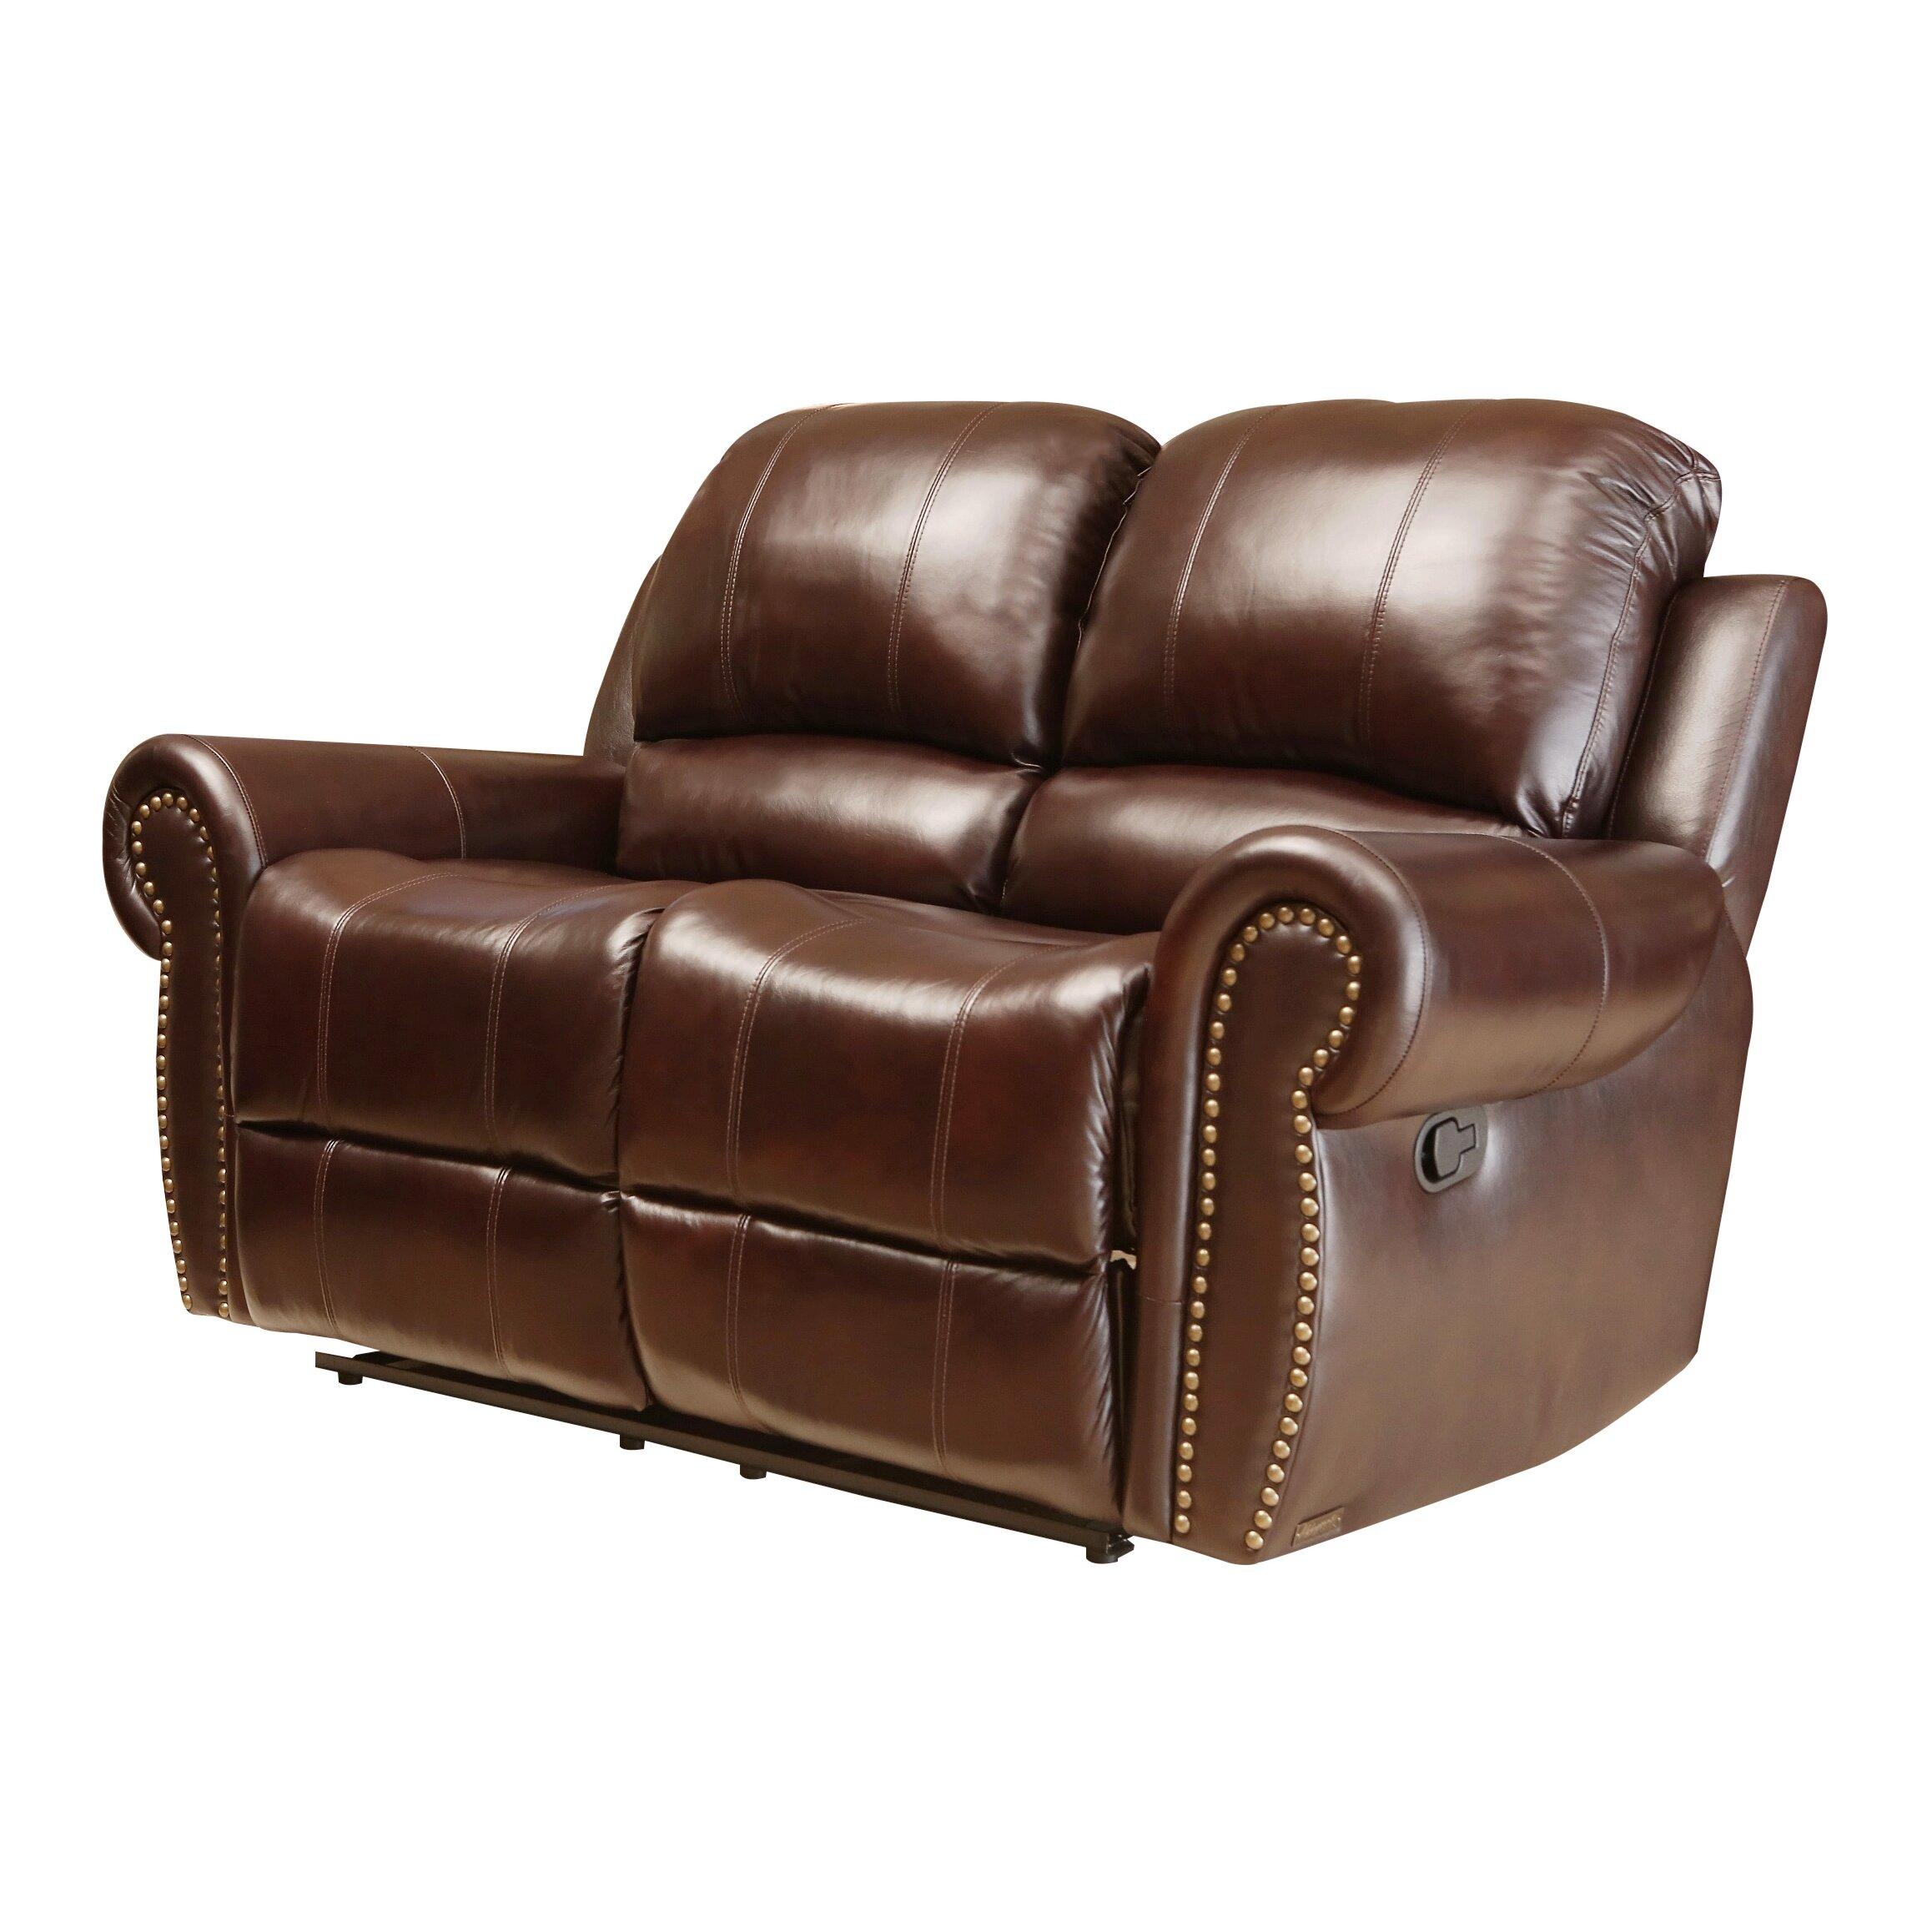 Abbyson Living Sedona Leather Reclining Loveseat Reviews Wayfair